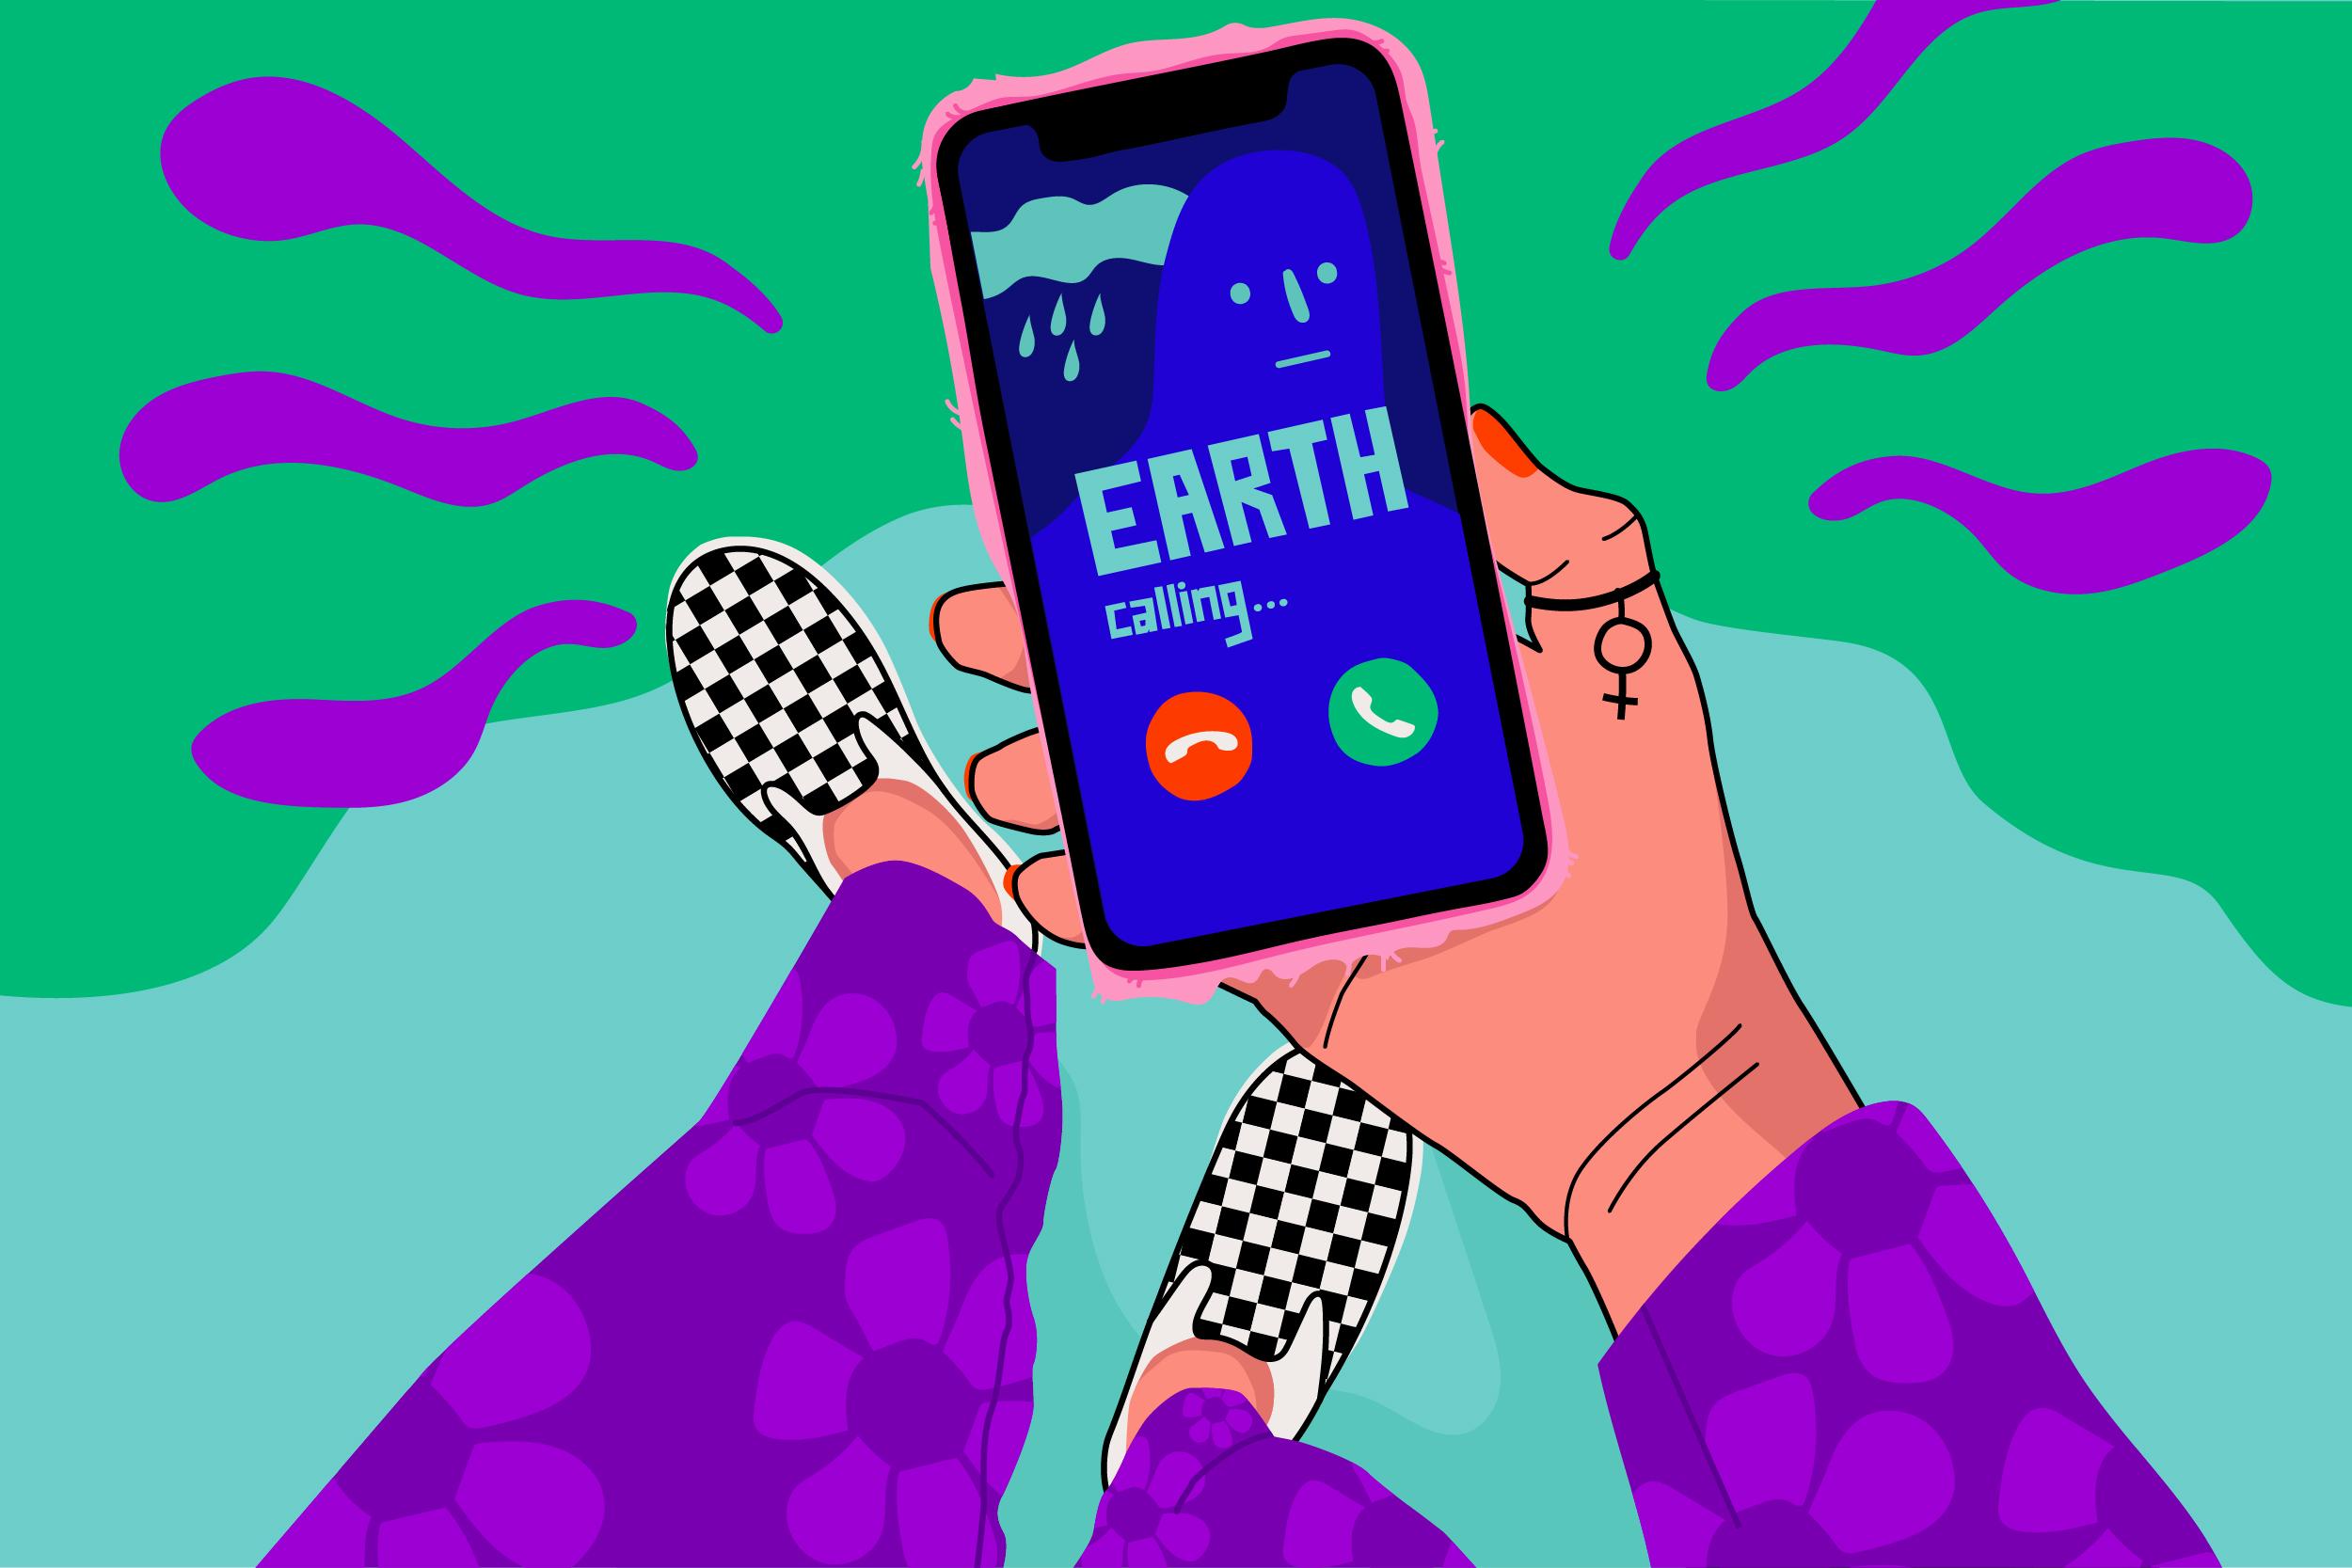 1200x800_earth_calling-01